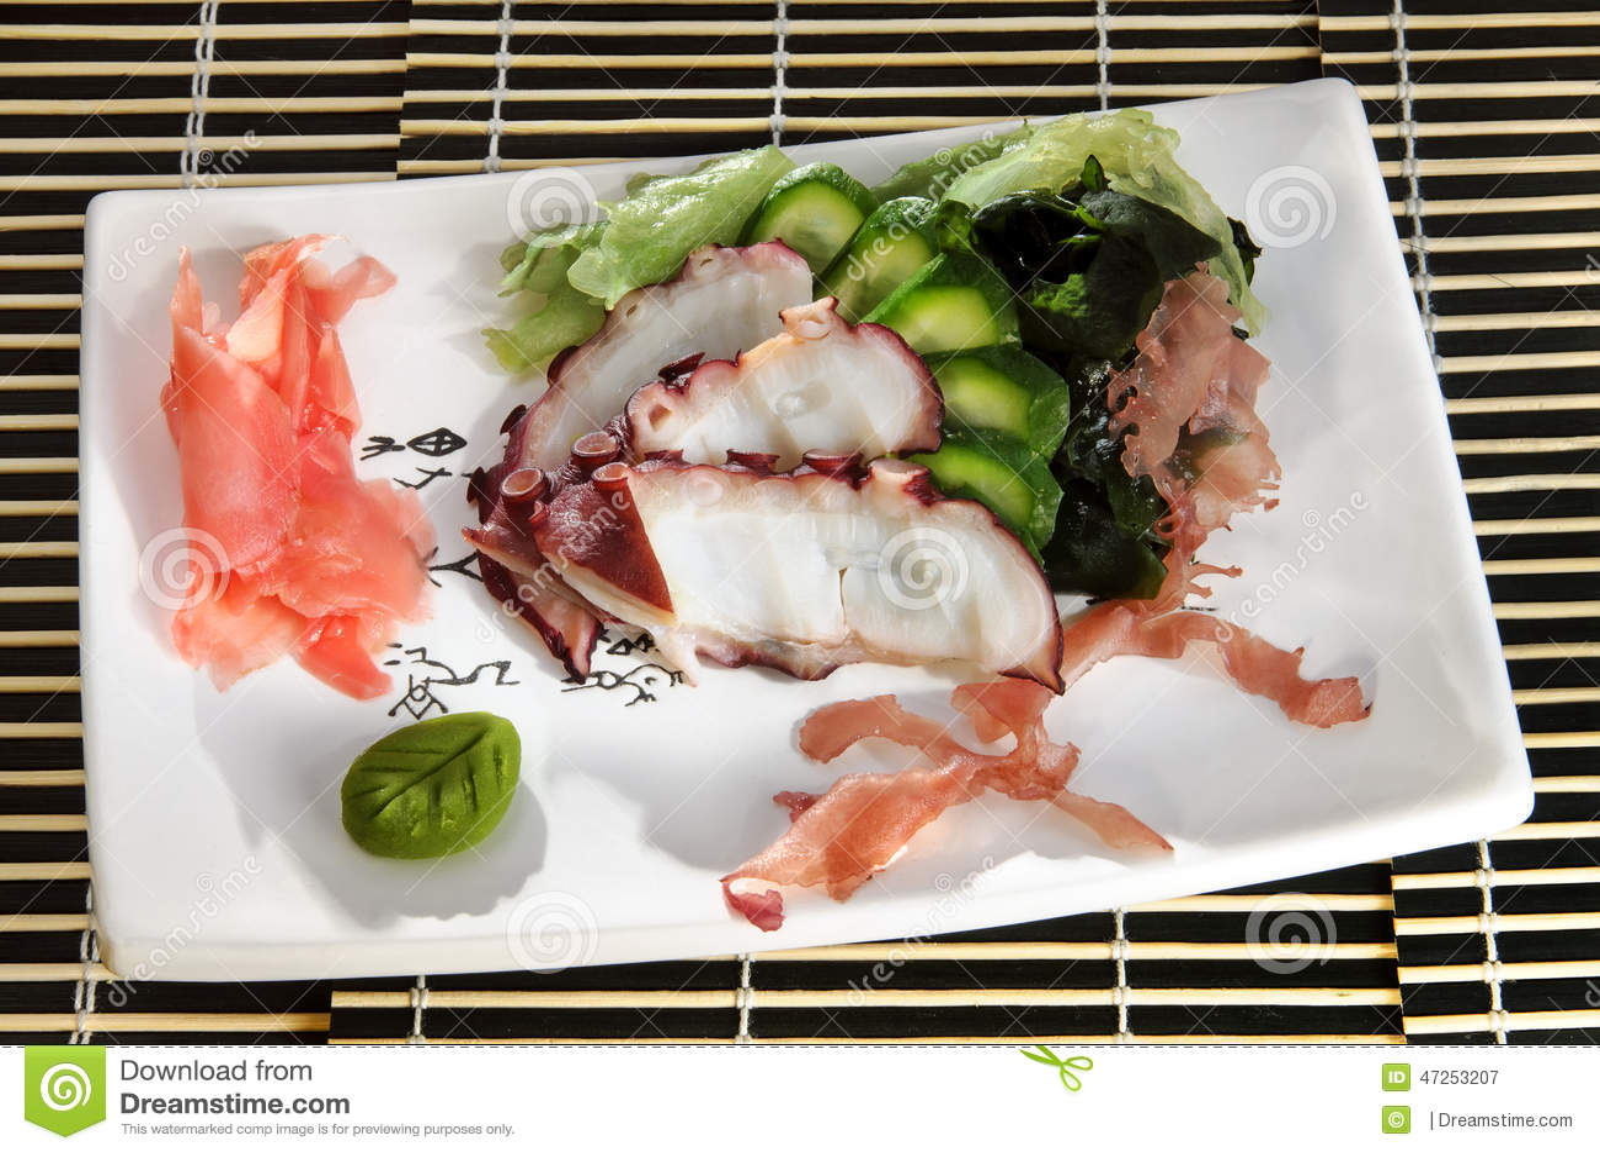 East Cafe Sushi Menu